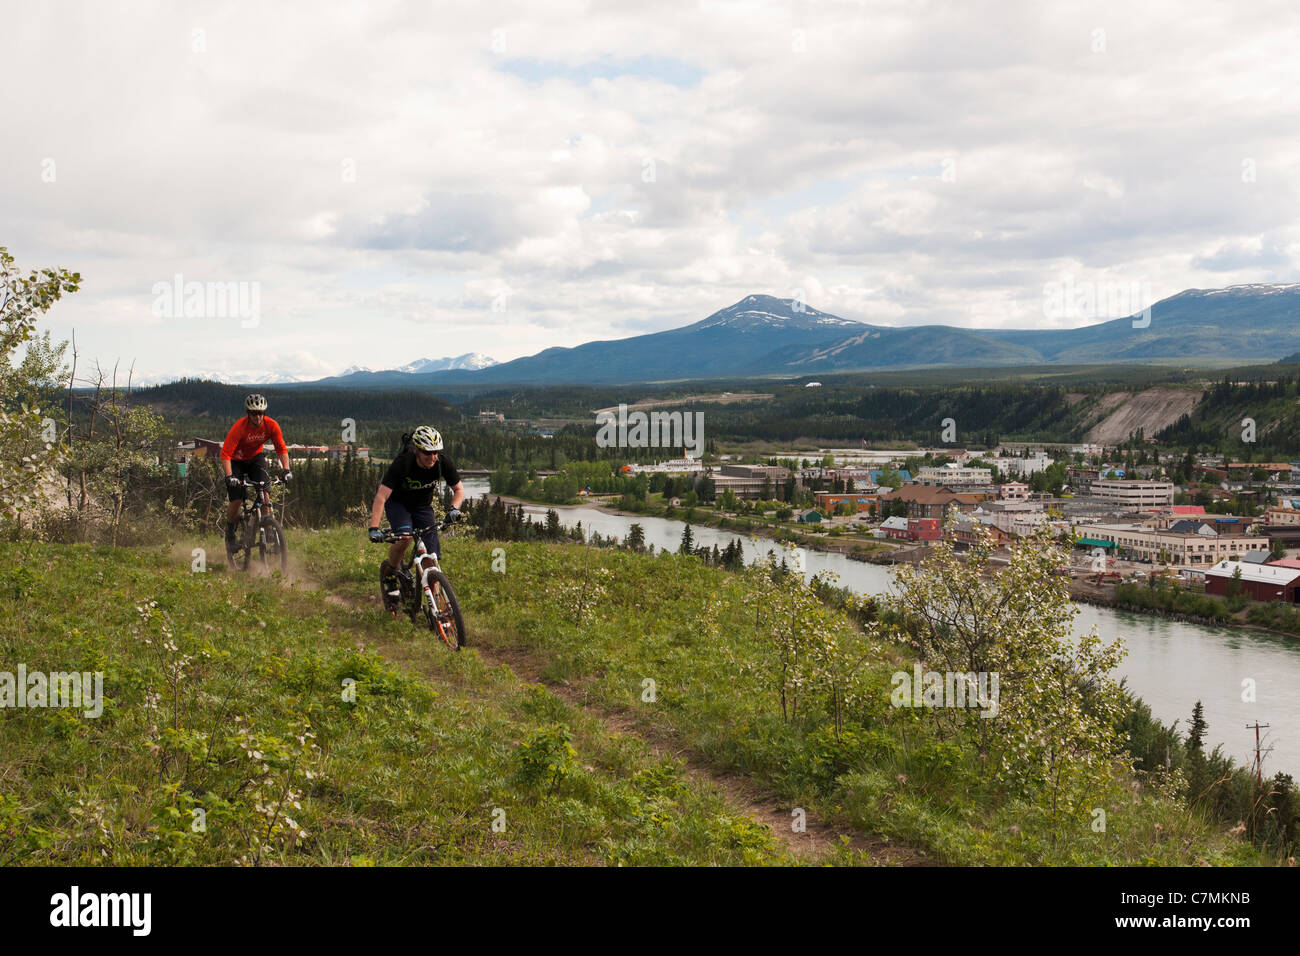 Mountain bikers riding a trail in Whitehorse, Yukon Territory, Canada - Stock Image